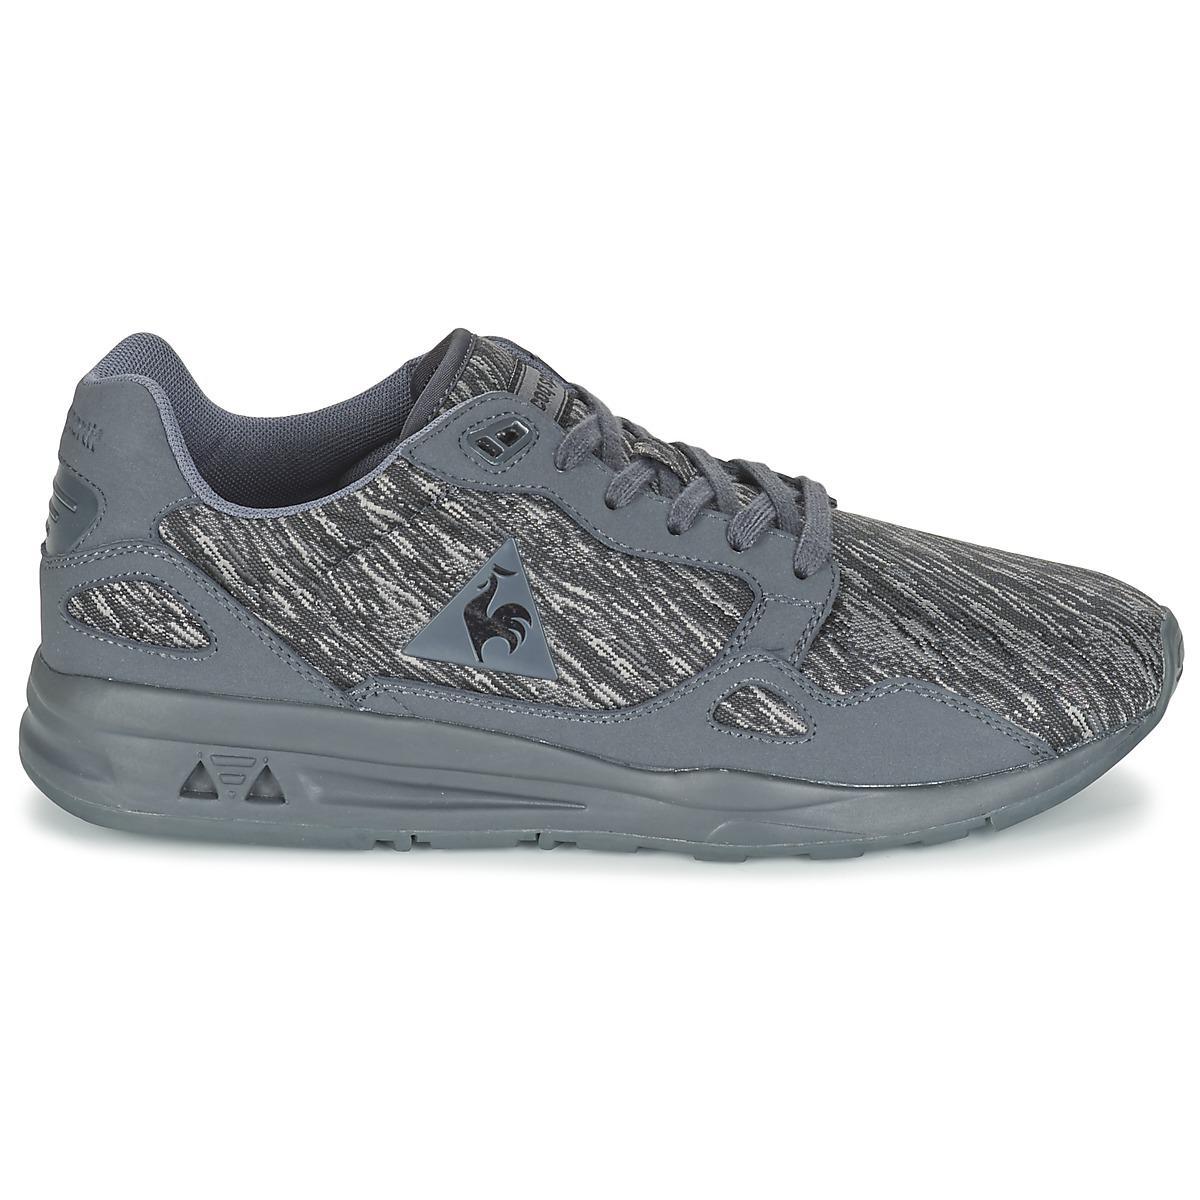 be223491e1e0 ... special section 310b4 67404 Le Coq Sportif Lcs R900 Interstellar  Jacquard Mens Shoes (tr ...